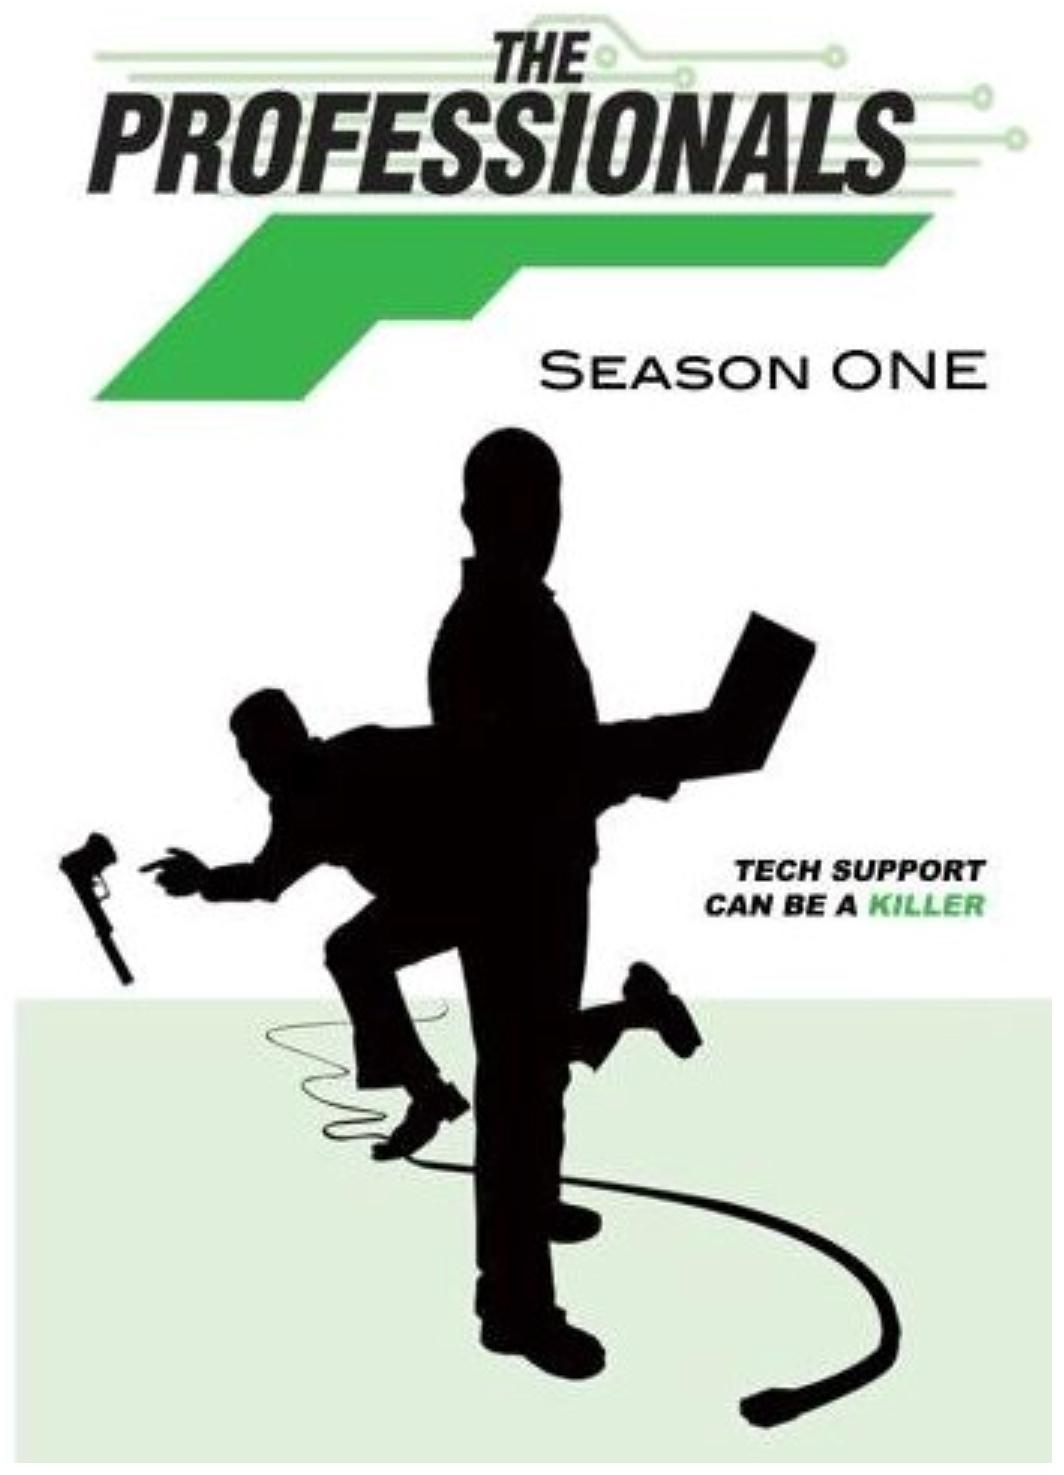 The Professionals (TV Series 2009– ) - IMDb